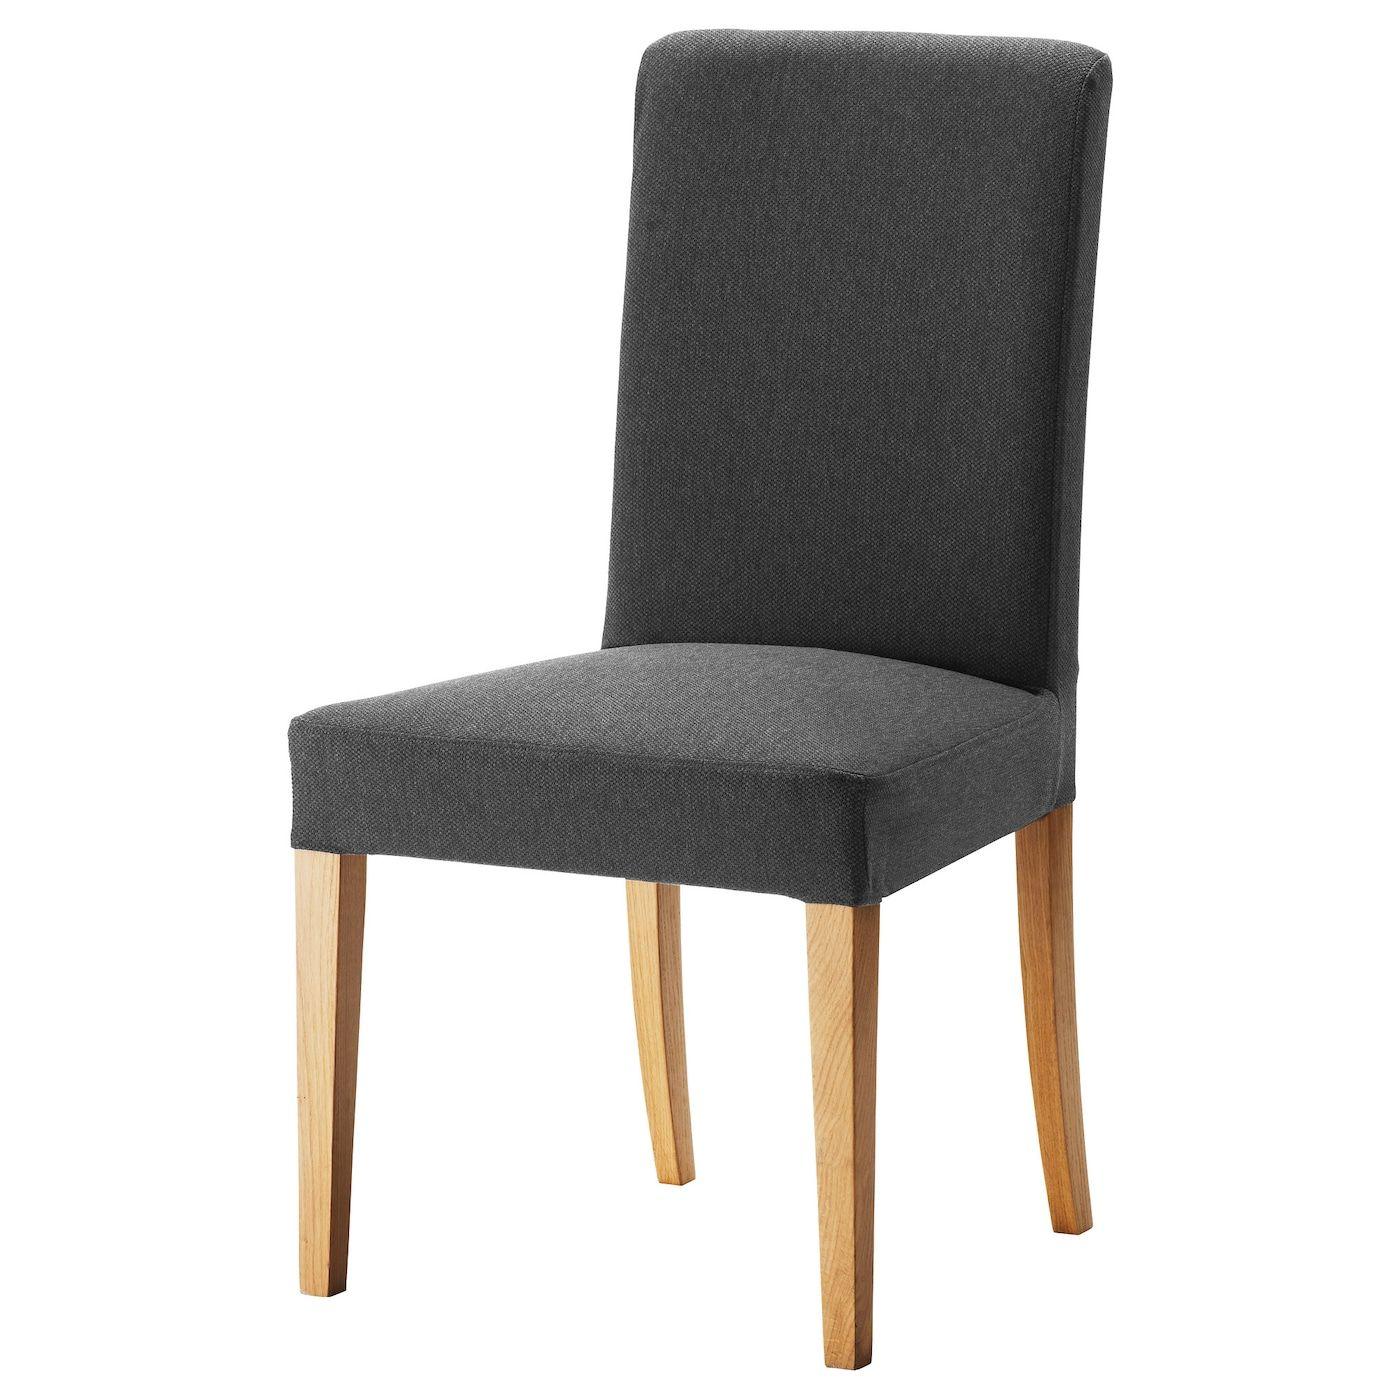 HENRIKSDAL Chair, Dansbo dark grey, Width 51 cm in 2020